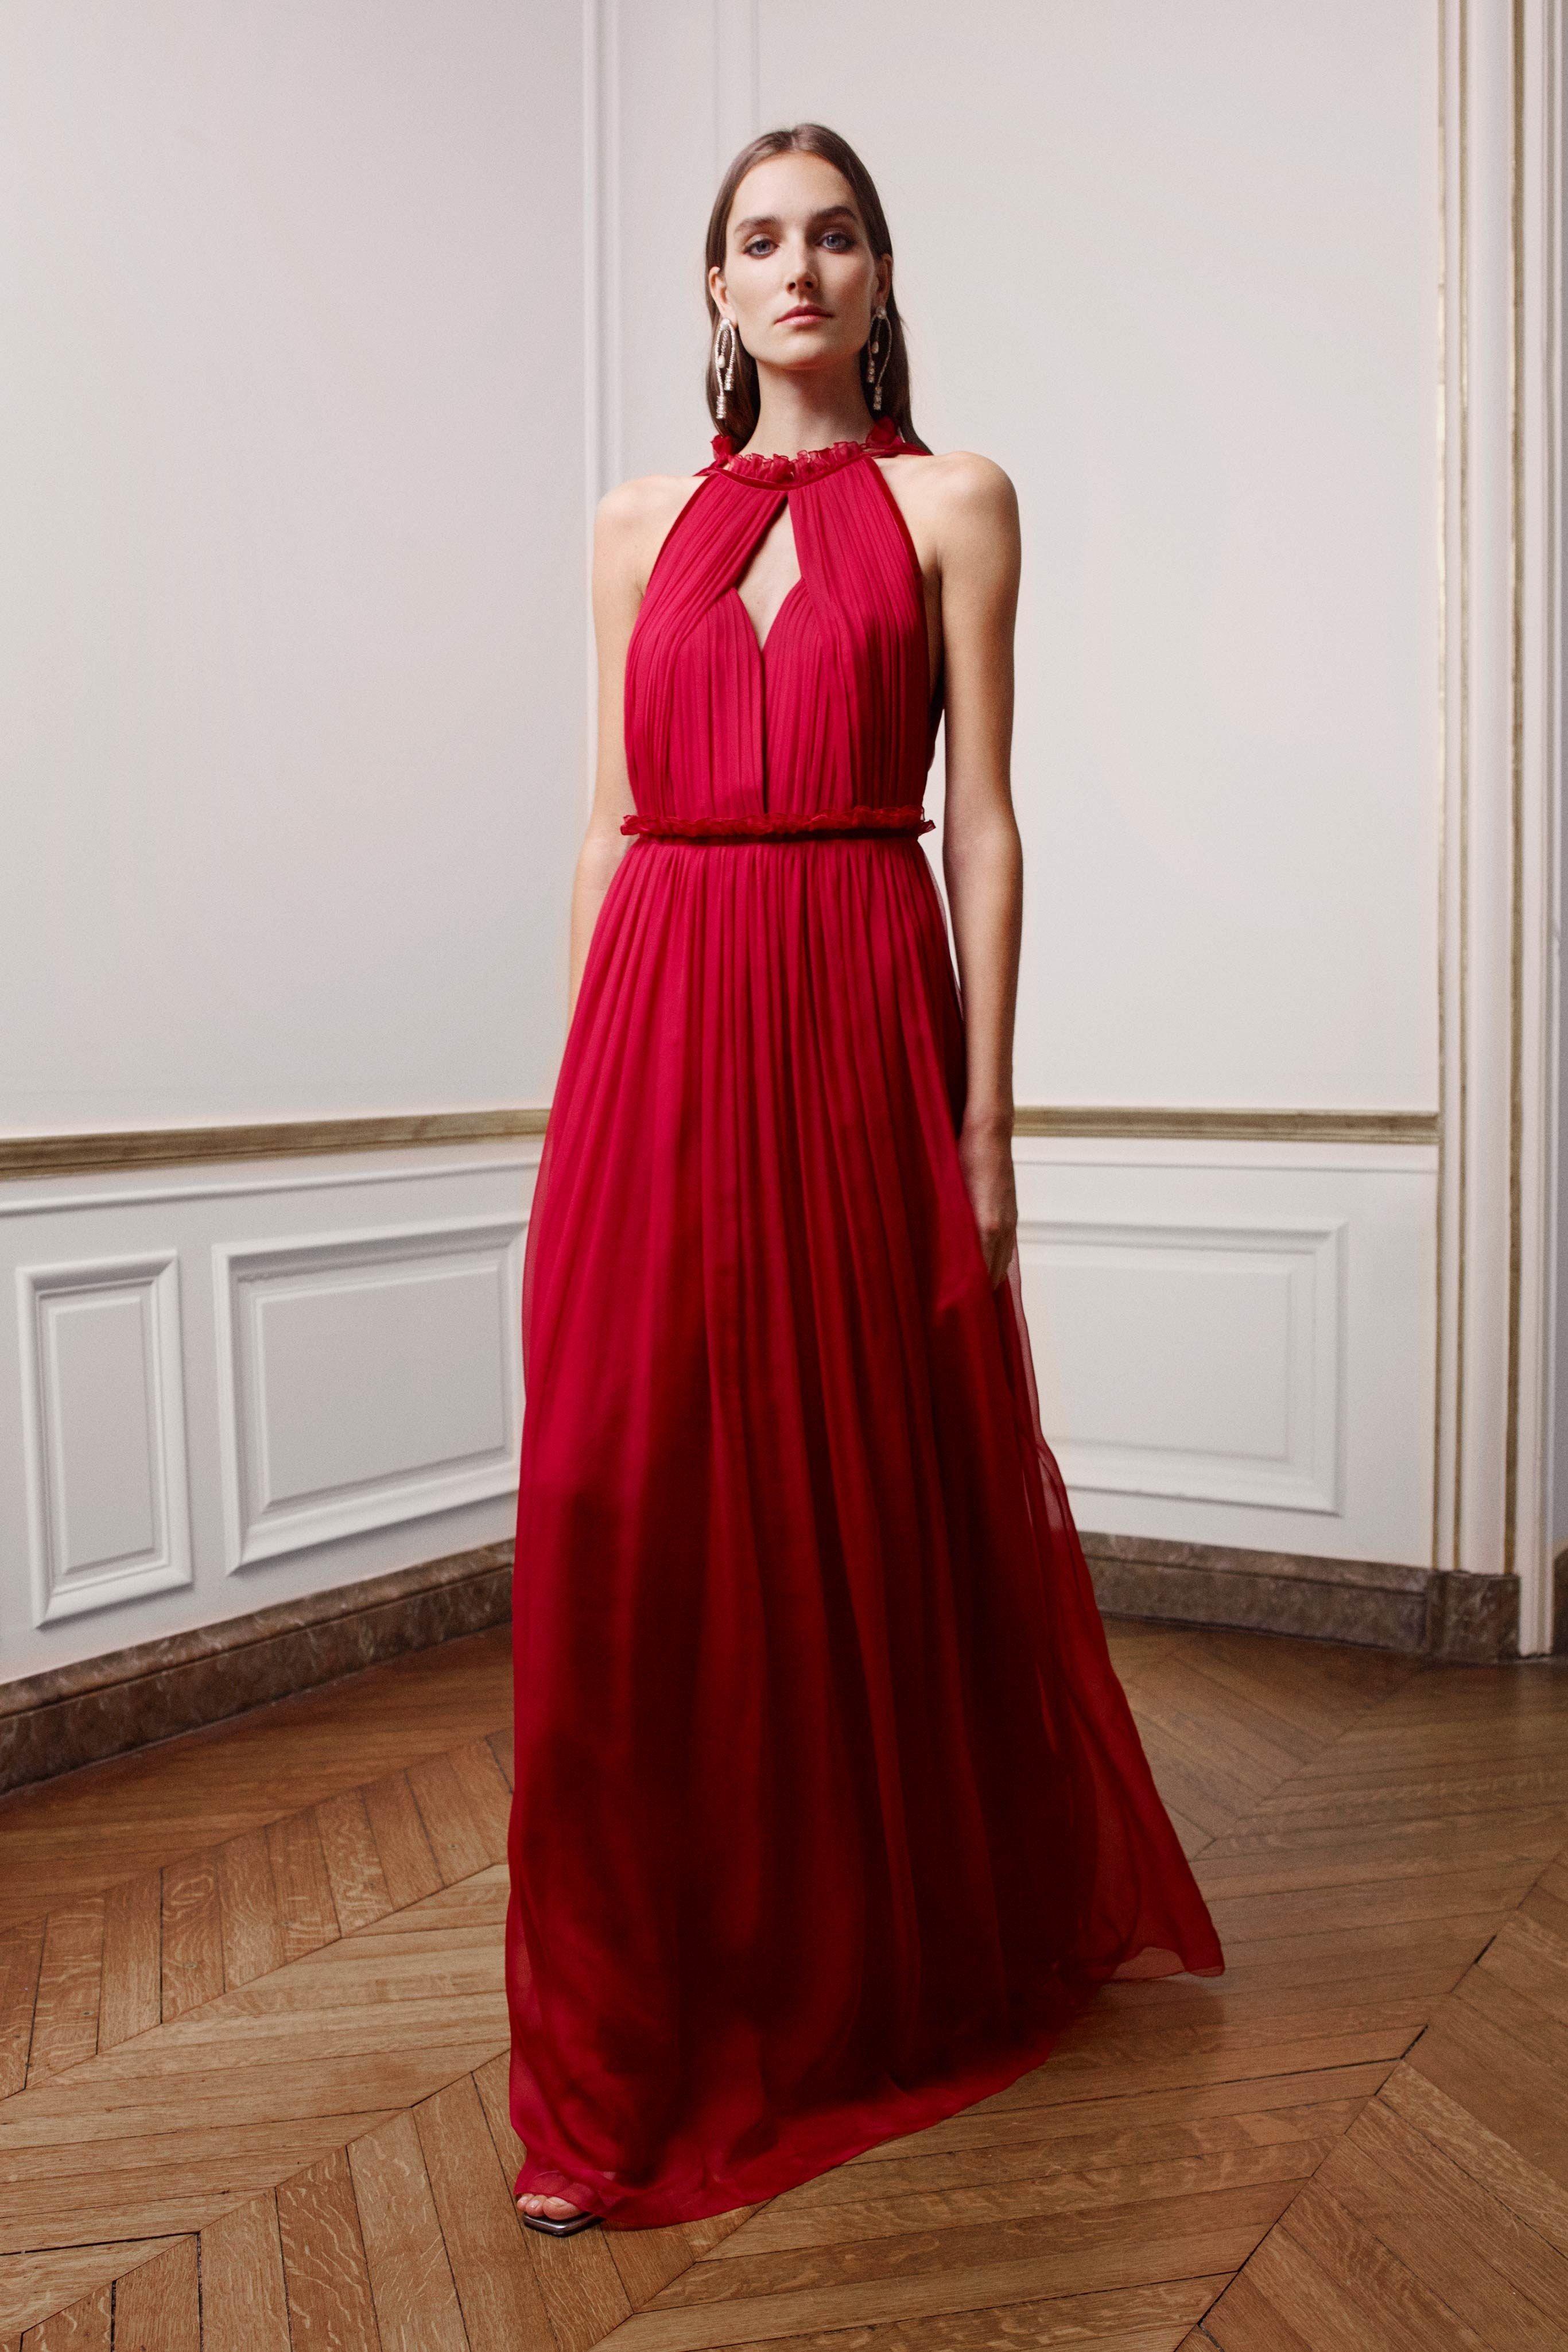 newest a71c4 40d6b Alberta Ferretti Limited Edition Spring 2019 Couture Fashion ...